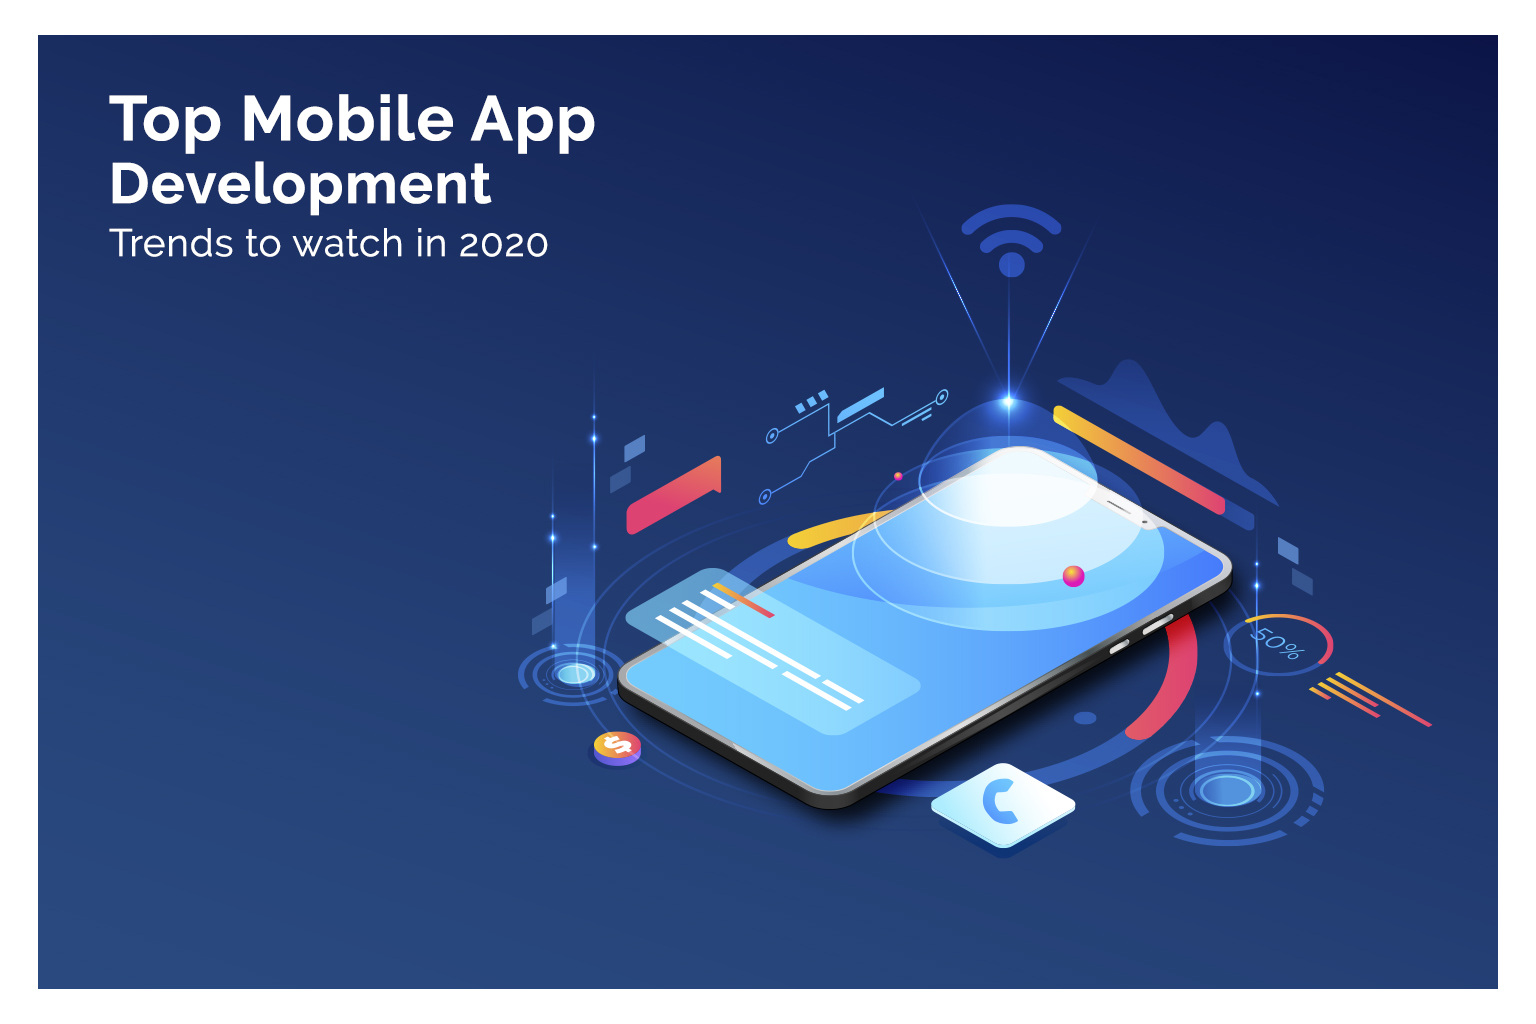 top mobile app development trends for 2020